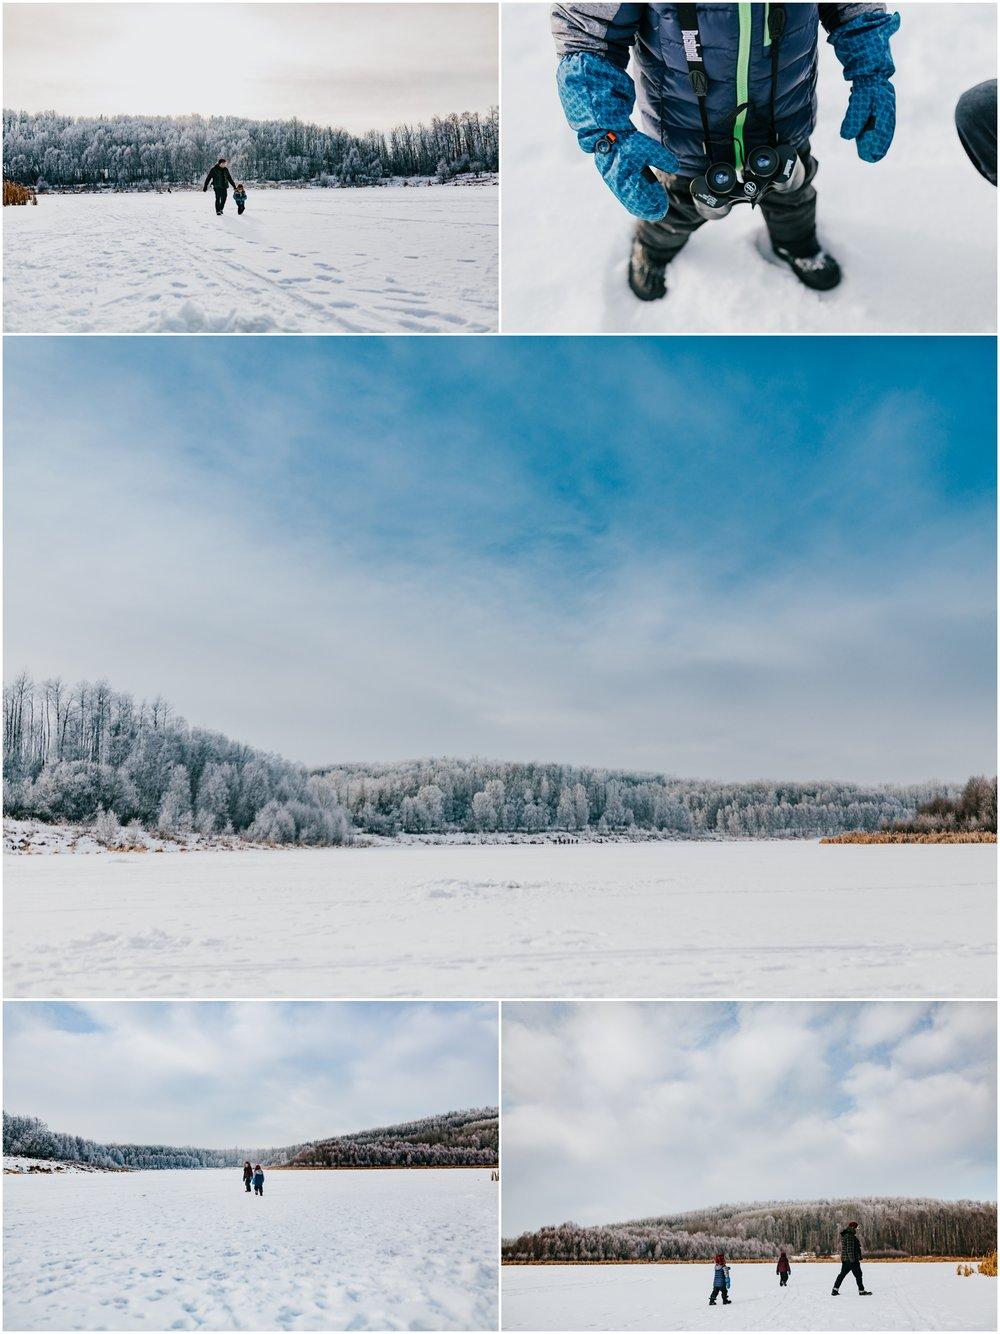 Frozen Winter Alberta Lake - Edmonton Photographer - Kids on a frozen lake.jpg